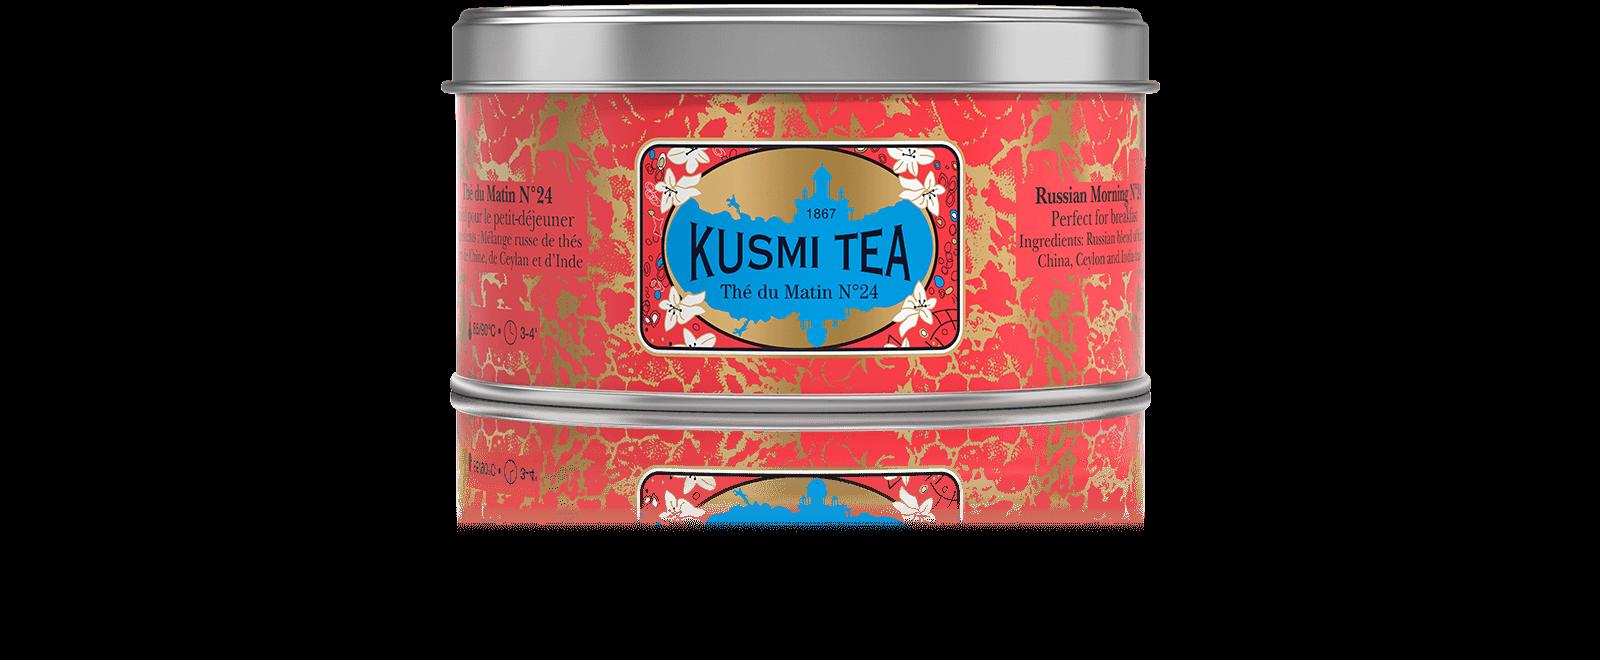 Thé du Matin N°24 - Thés noirs de Ceylan et de Chine - Kusmi Tea